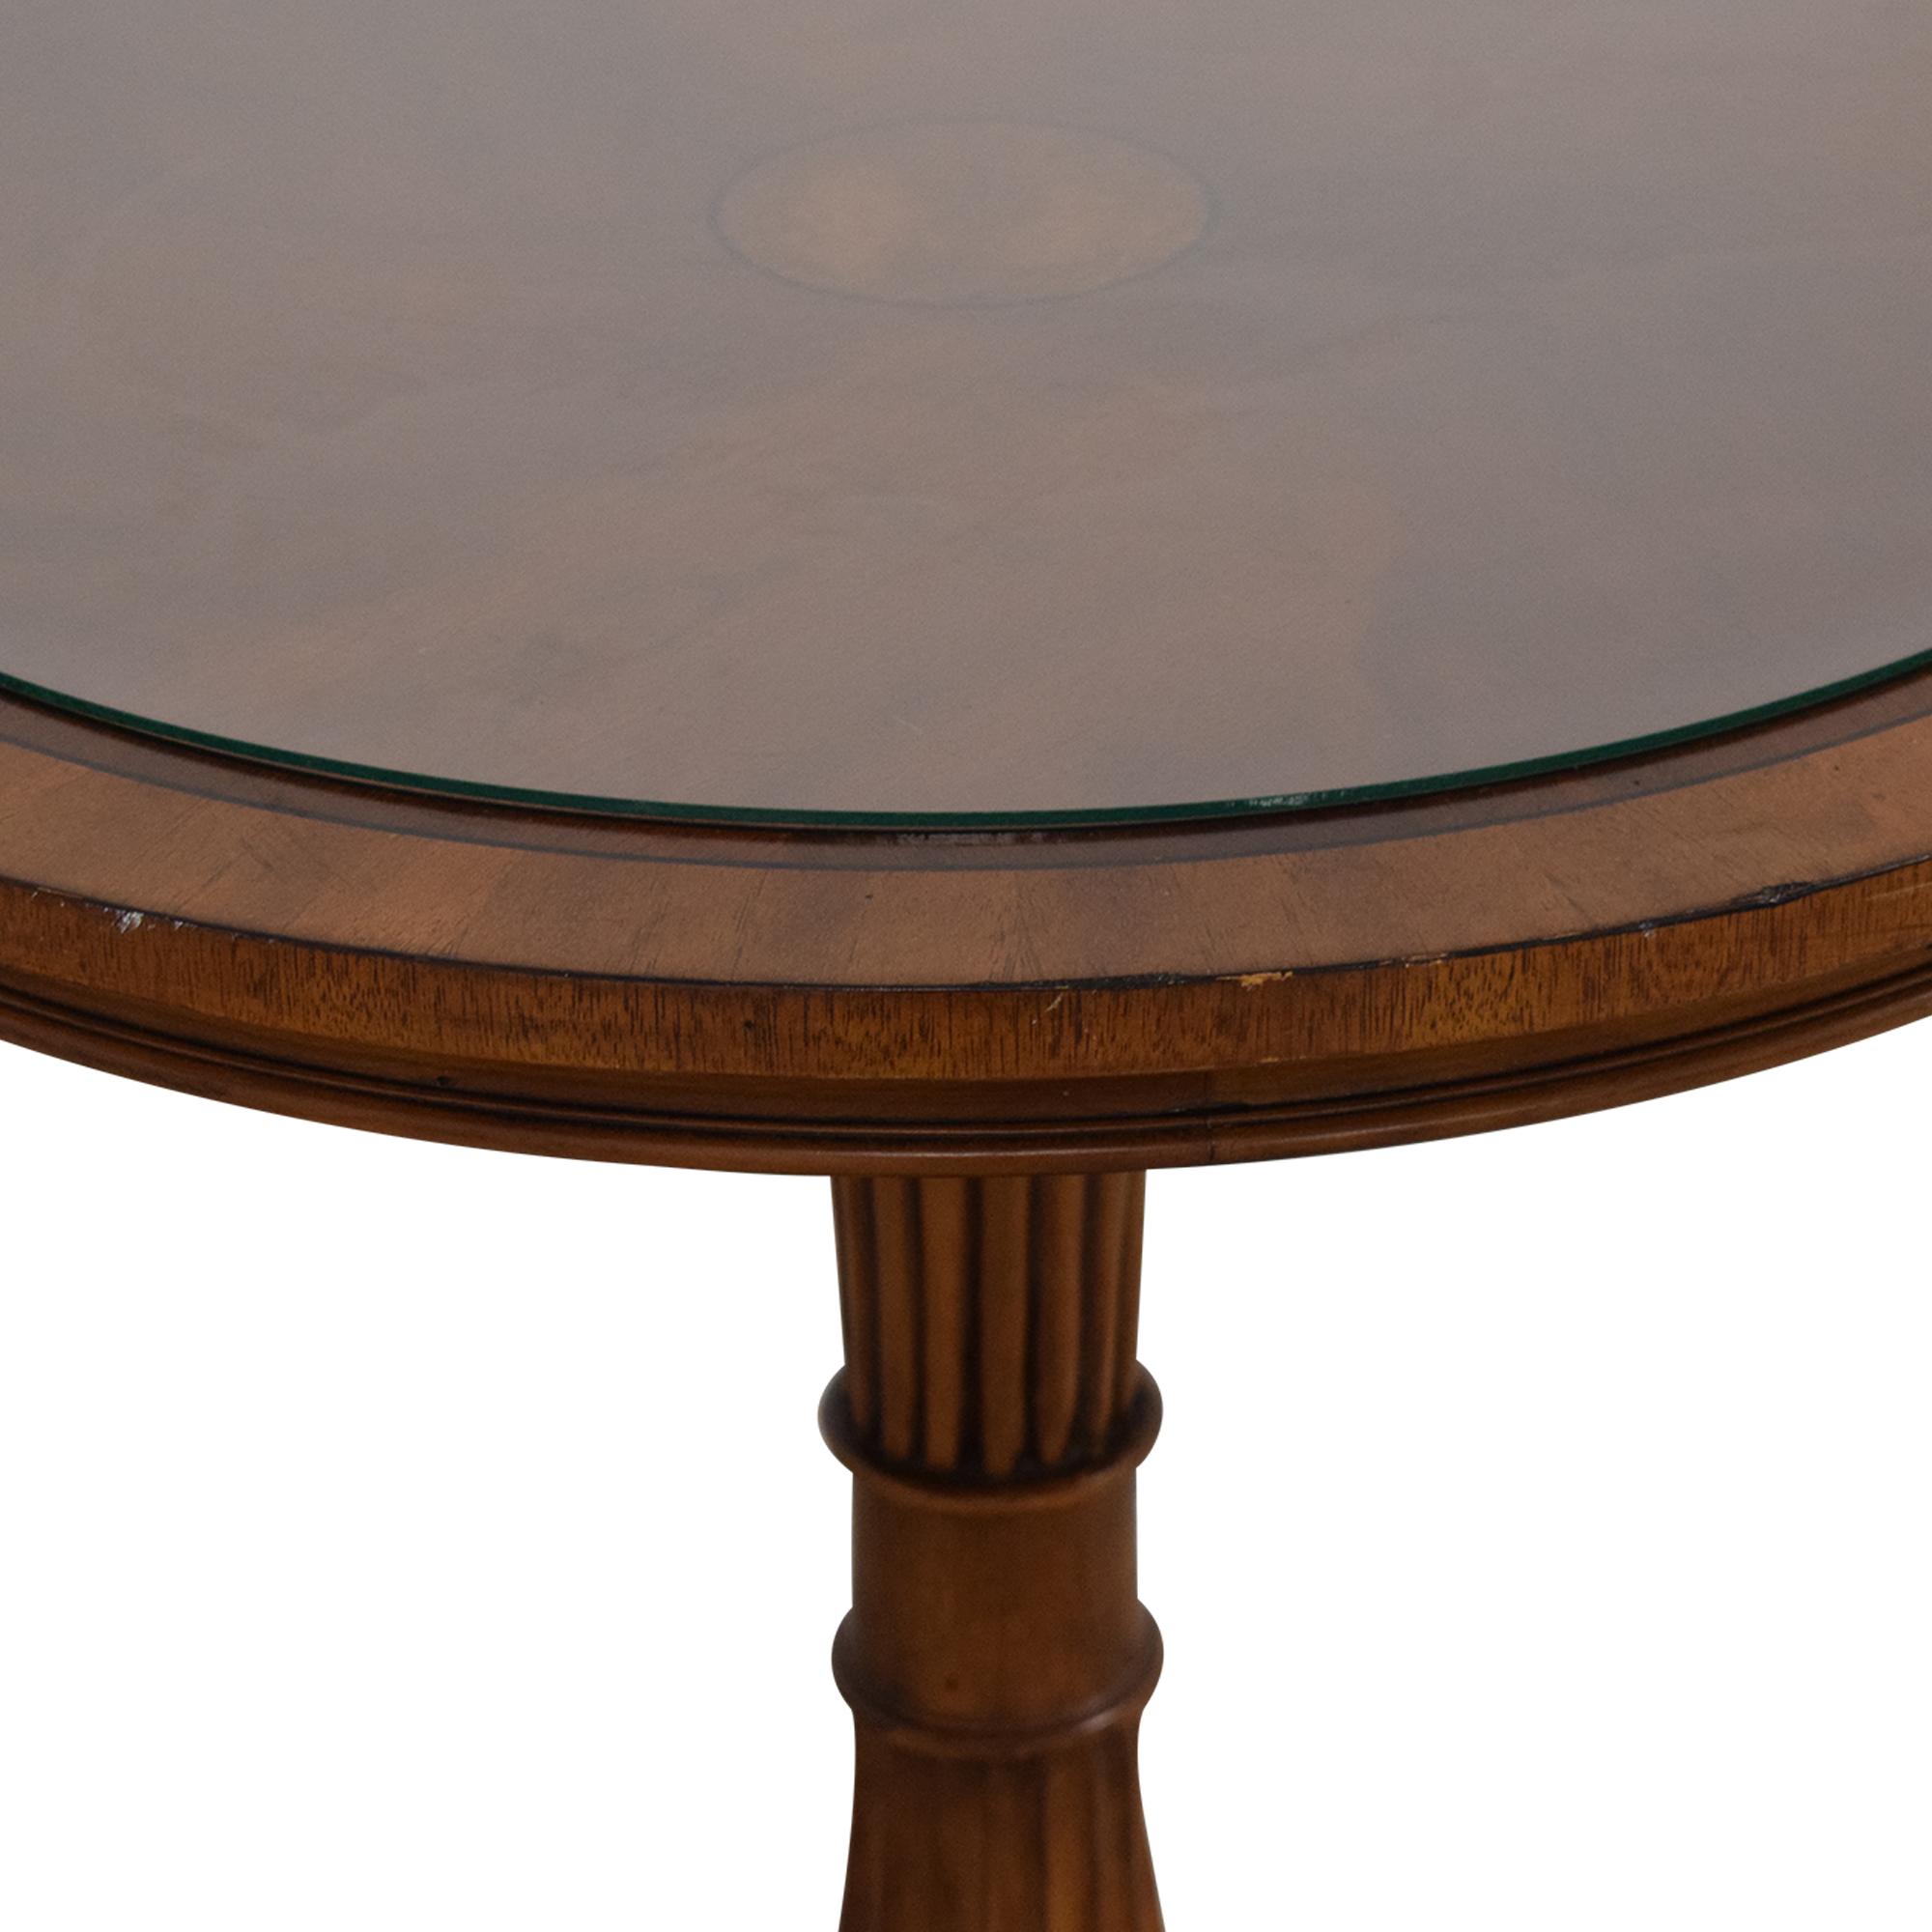 Ethan Allen Ethan Allen Pedestal Table dimensions